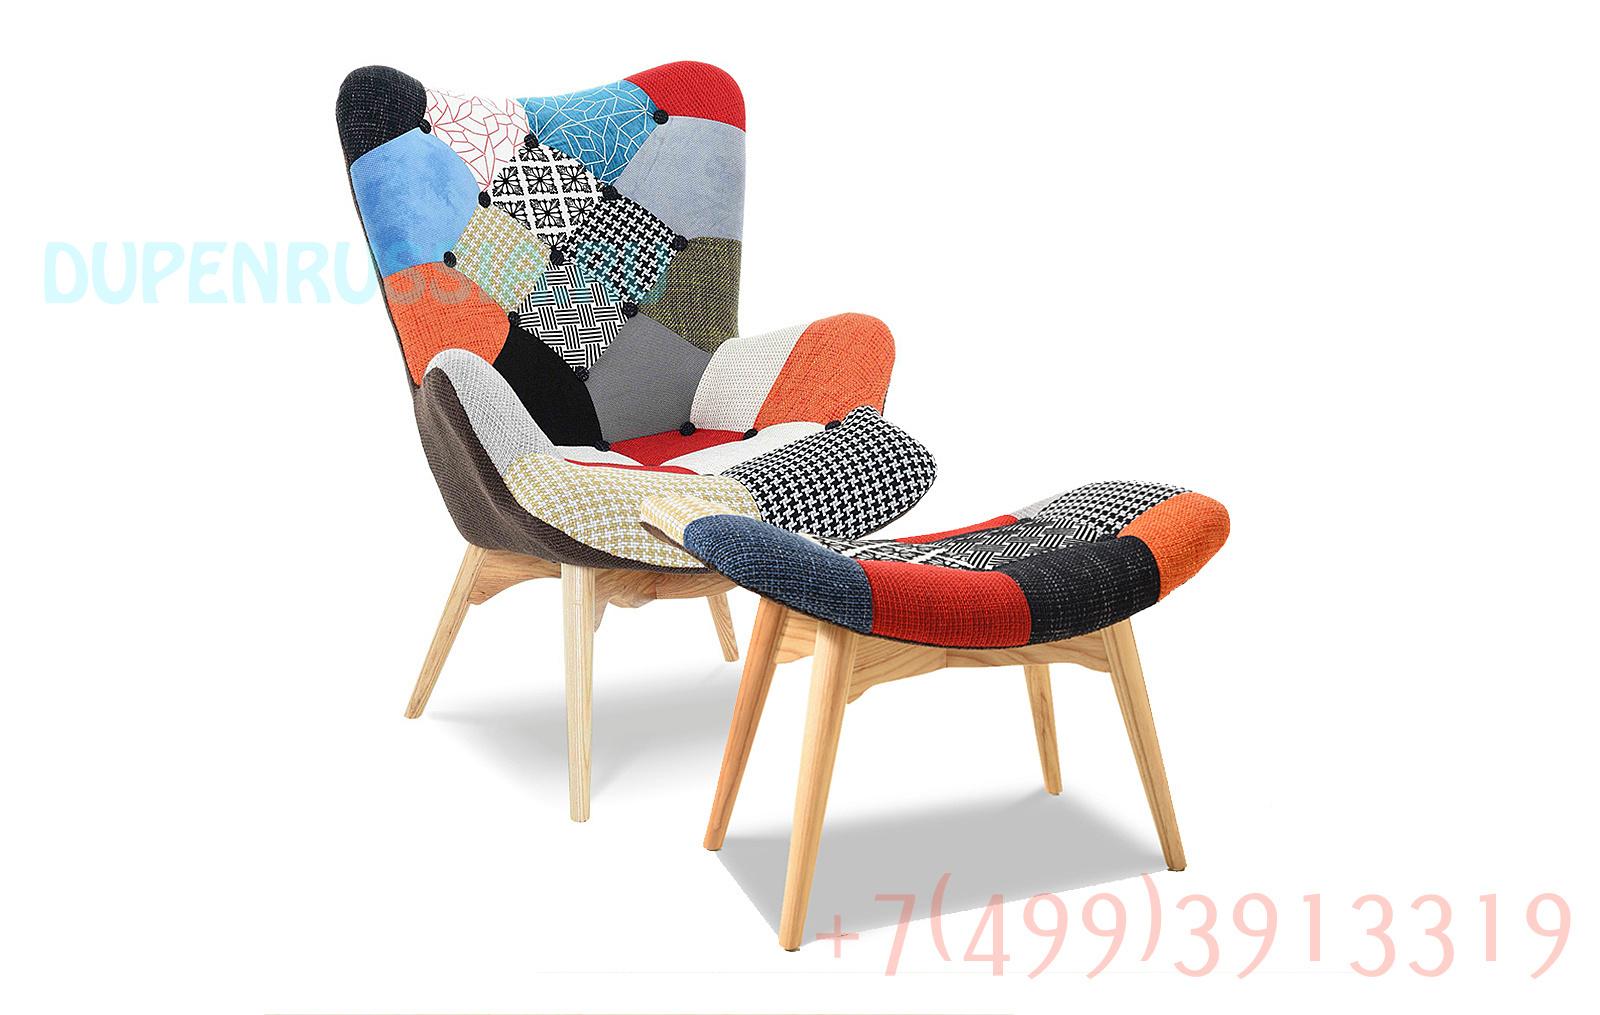 Кресло DС-917(P) patchwork + банкетка DС-917F(P) patchwork